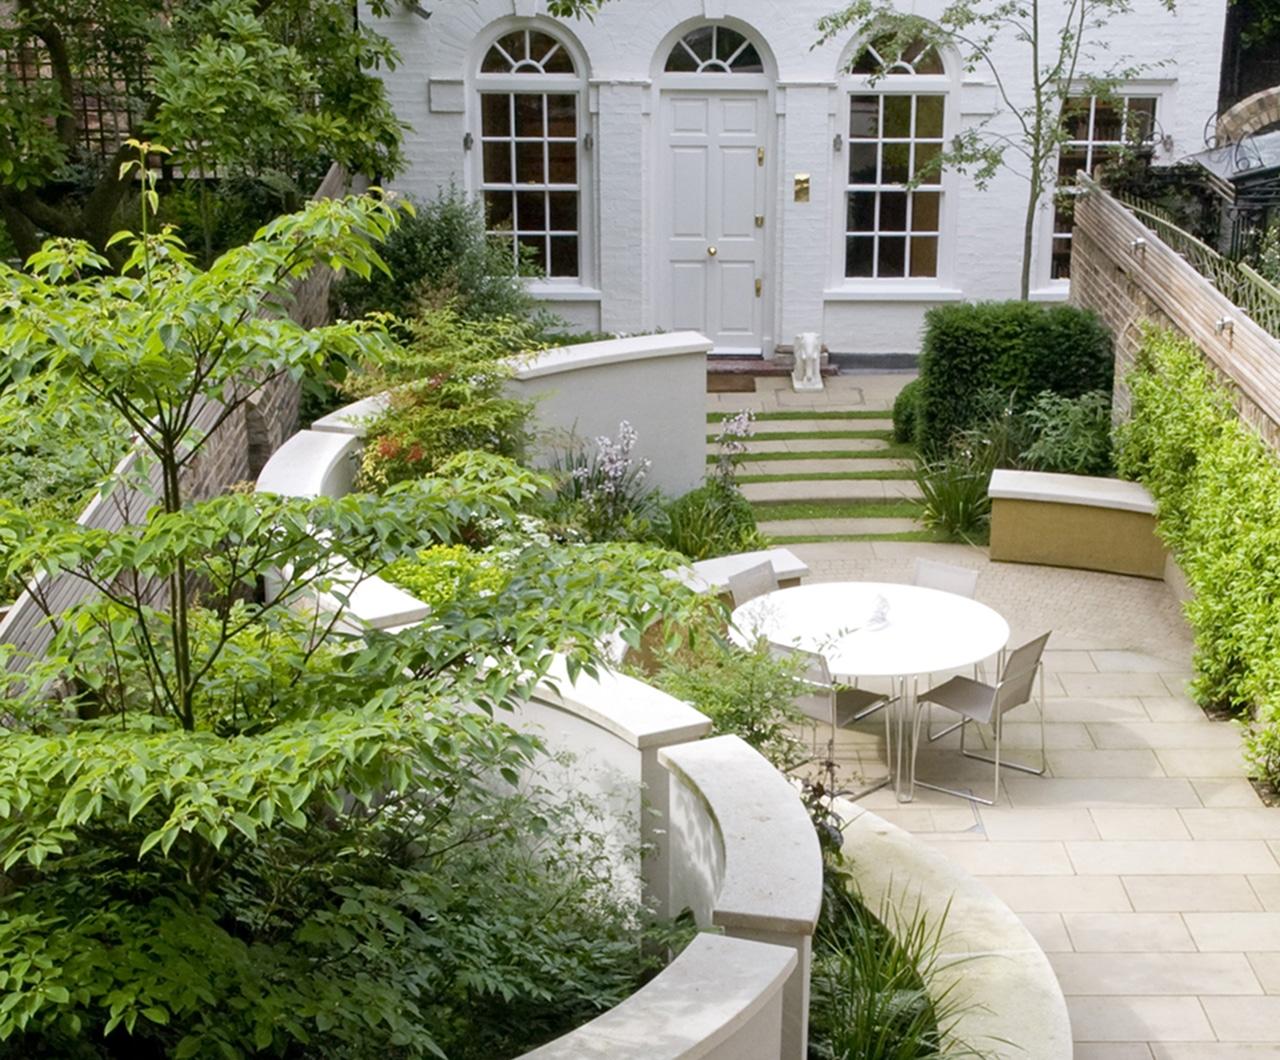 Garden Ideas Small Landscape Gardens Pictures Gallery: Small Garden Design In Chelsea